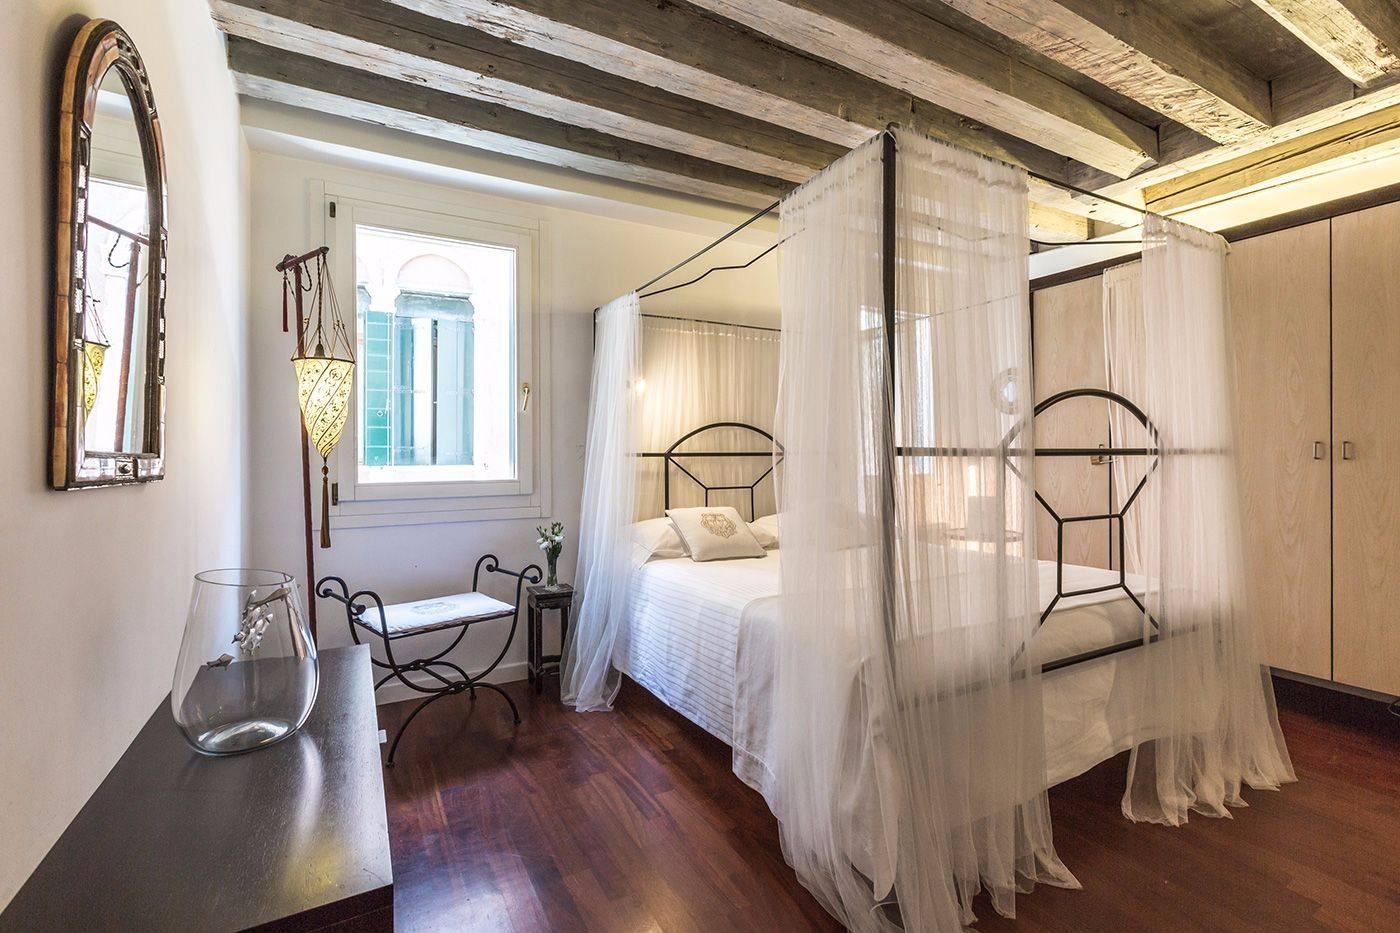 the master bedroom is very romantic